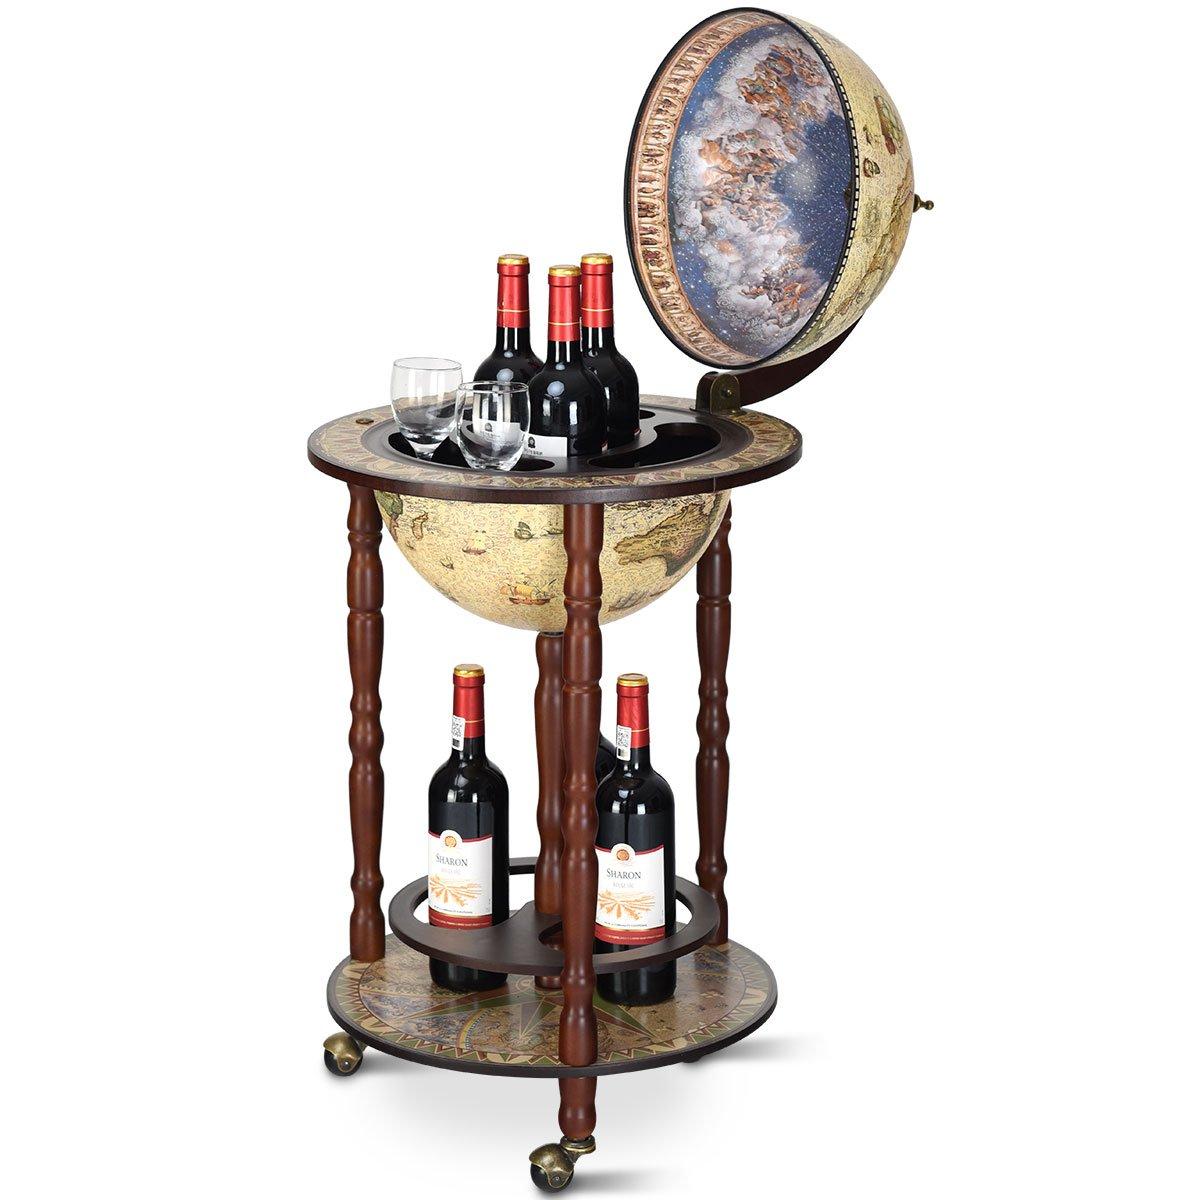 Goplus 17″ Wood Globe Wine Bar Stand 16th Century Italian Rack Liquor Bottle Shelf with Wheels (Retro Brown)